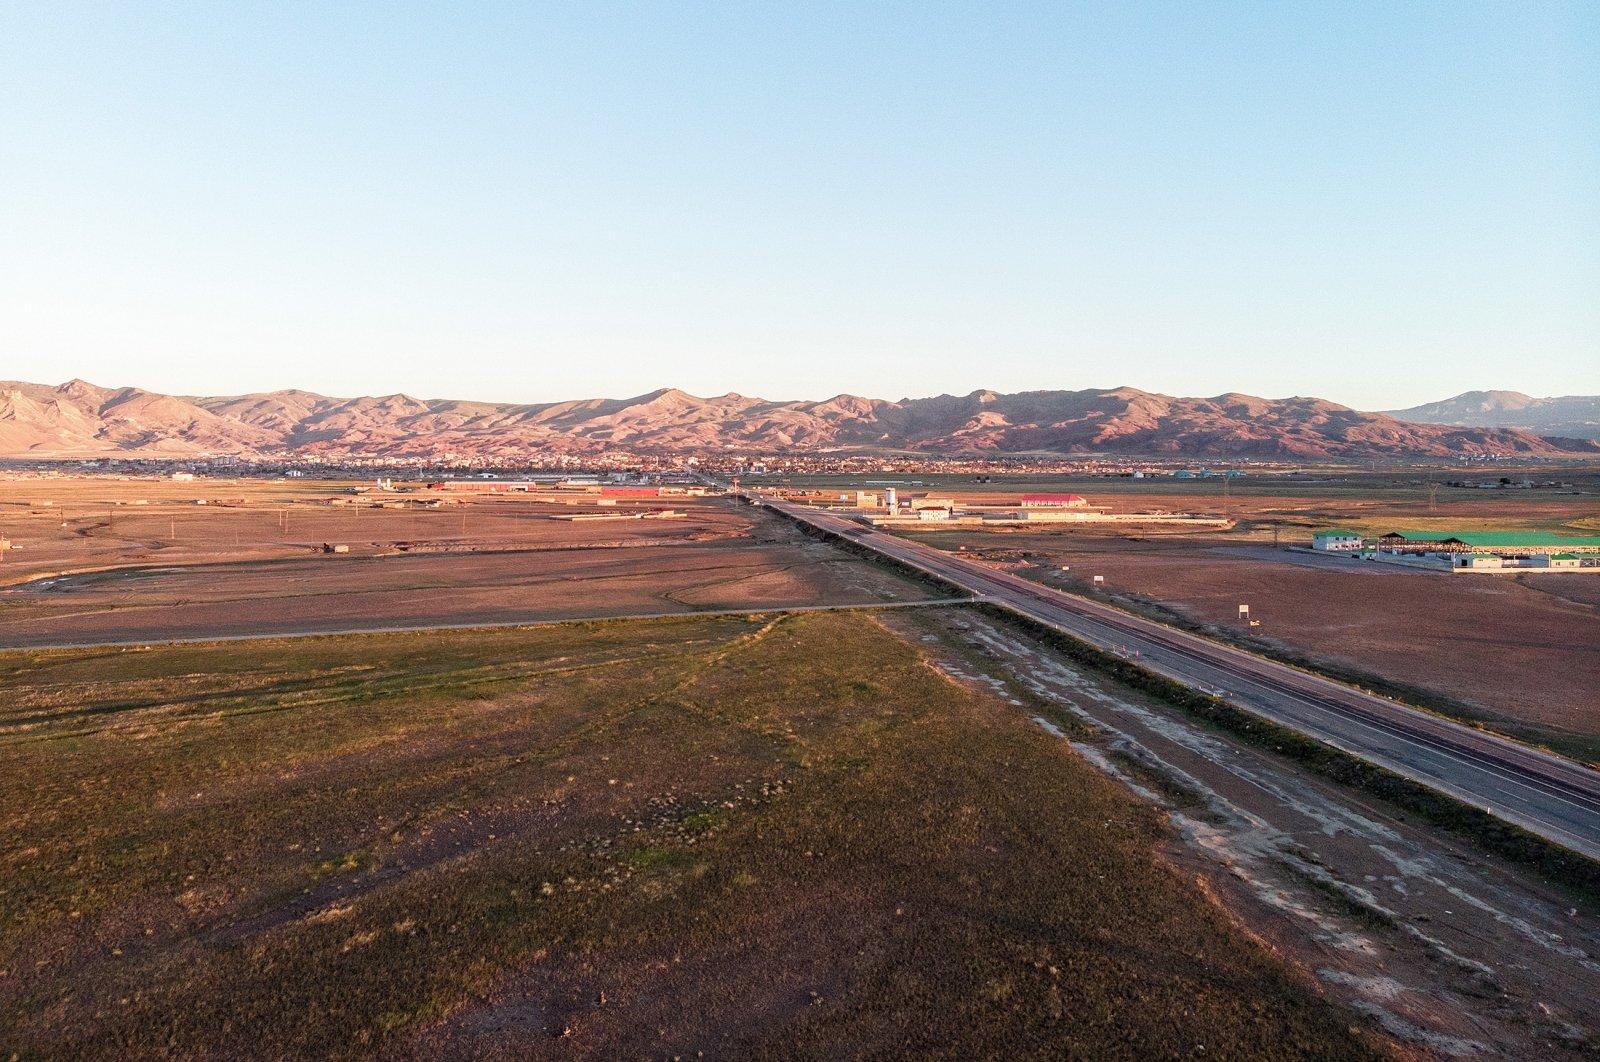 Aerial view of the road leading to Doğubayazıt from Iğdır around Mount Ağrı, eastern Turkey on the border with Armenia and Iran. (Shutterstock File Photo)